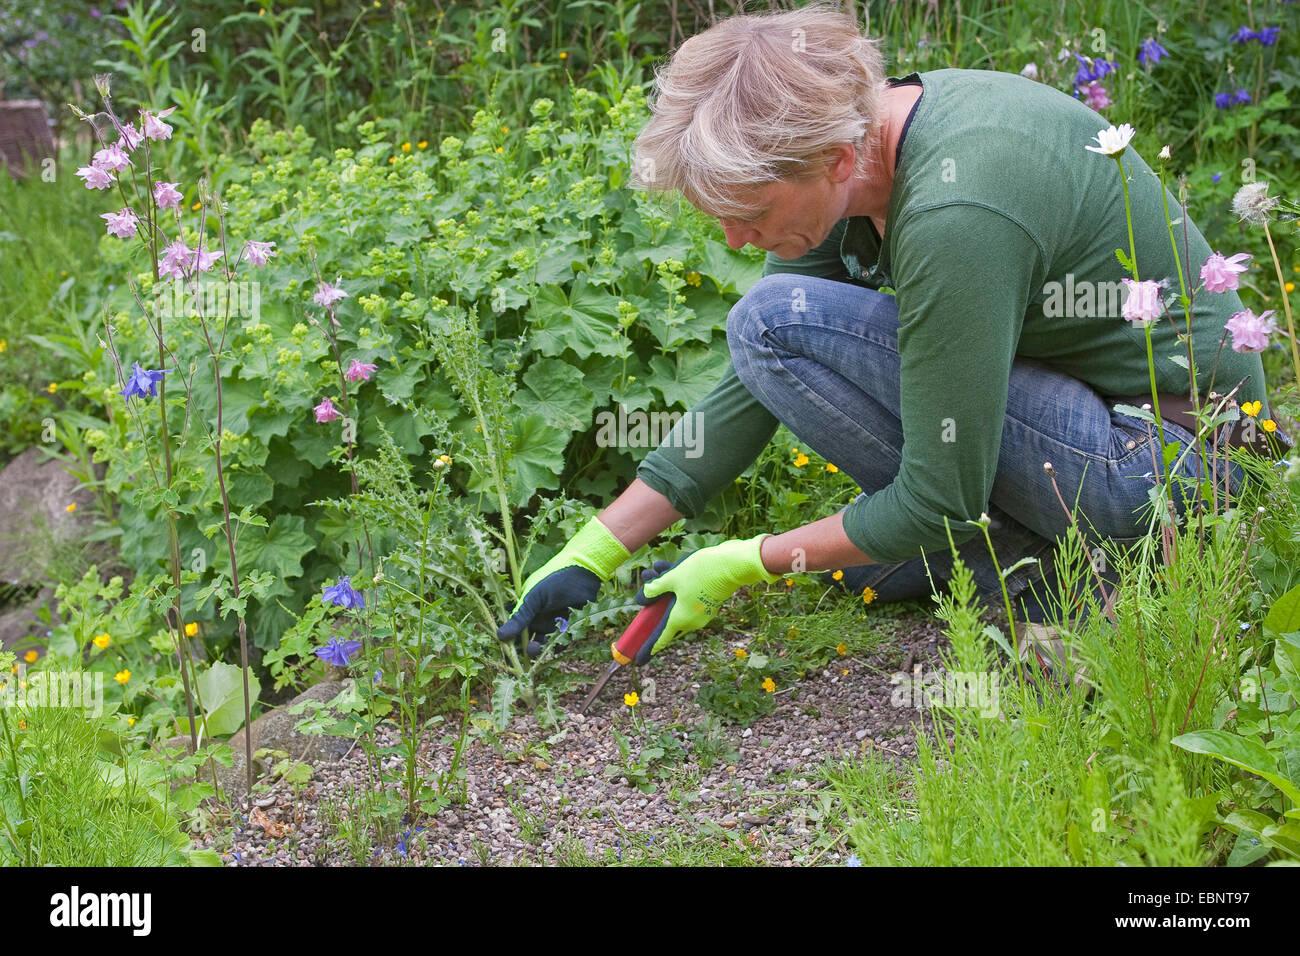 woman weeding the garden, Germany Stock Photo: 76082755 - Alamy